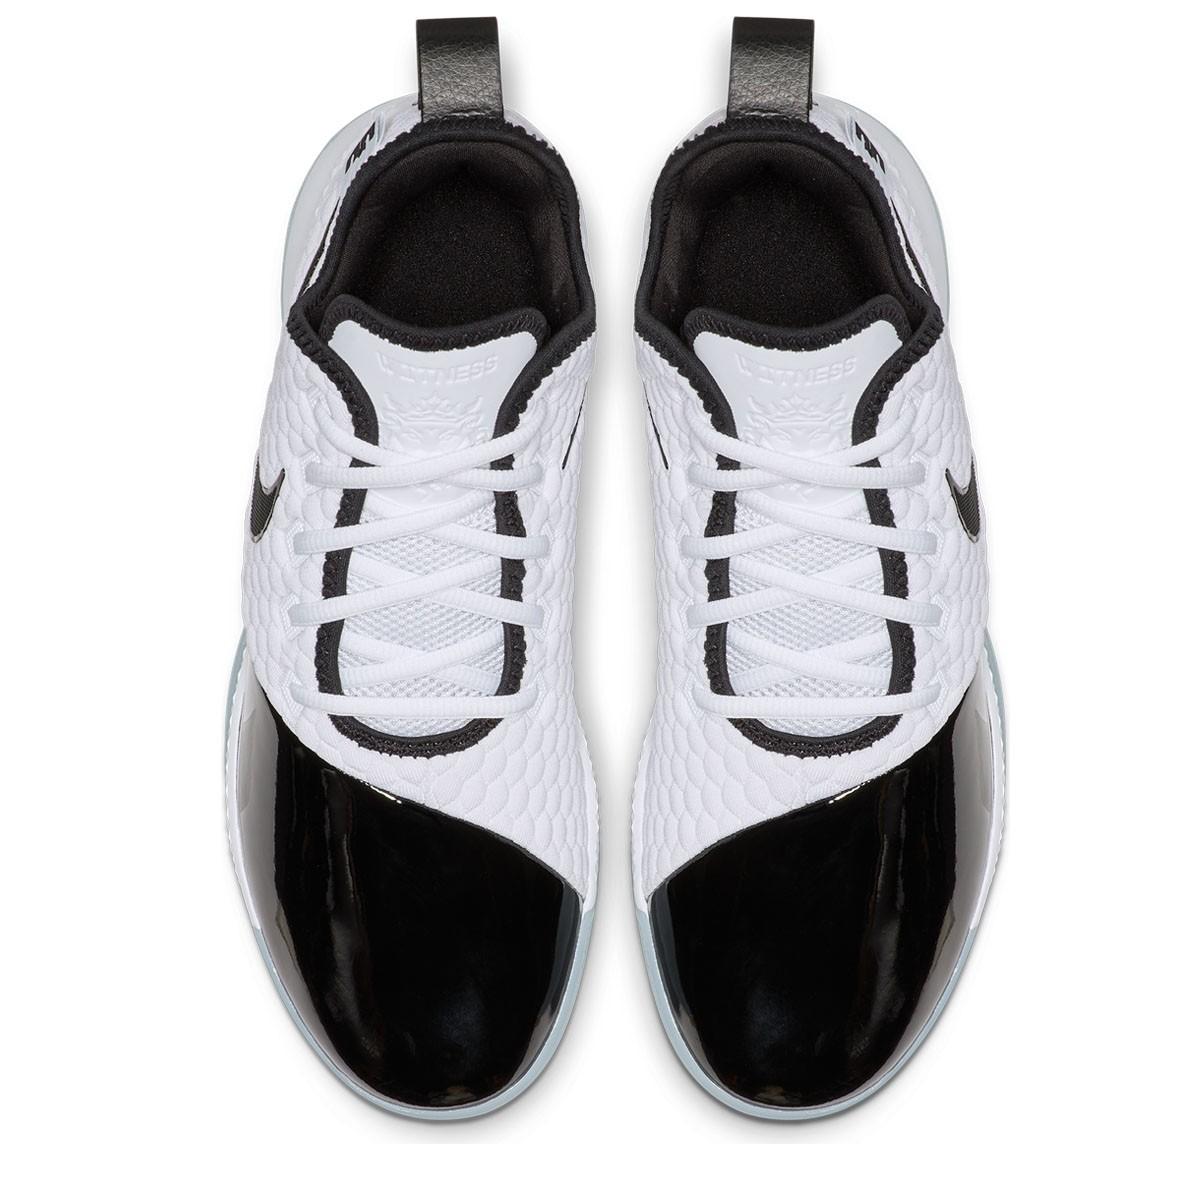 Nike Lebron Witness III PRM GS 'Concord' BQ9819-100-JR